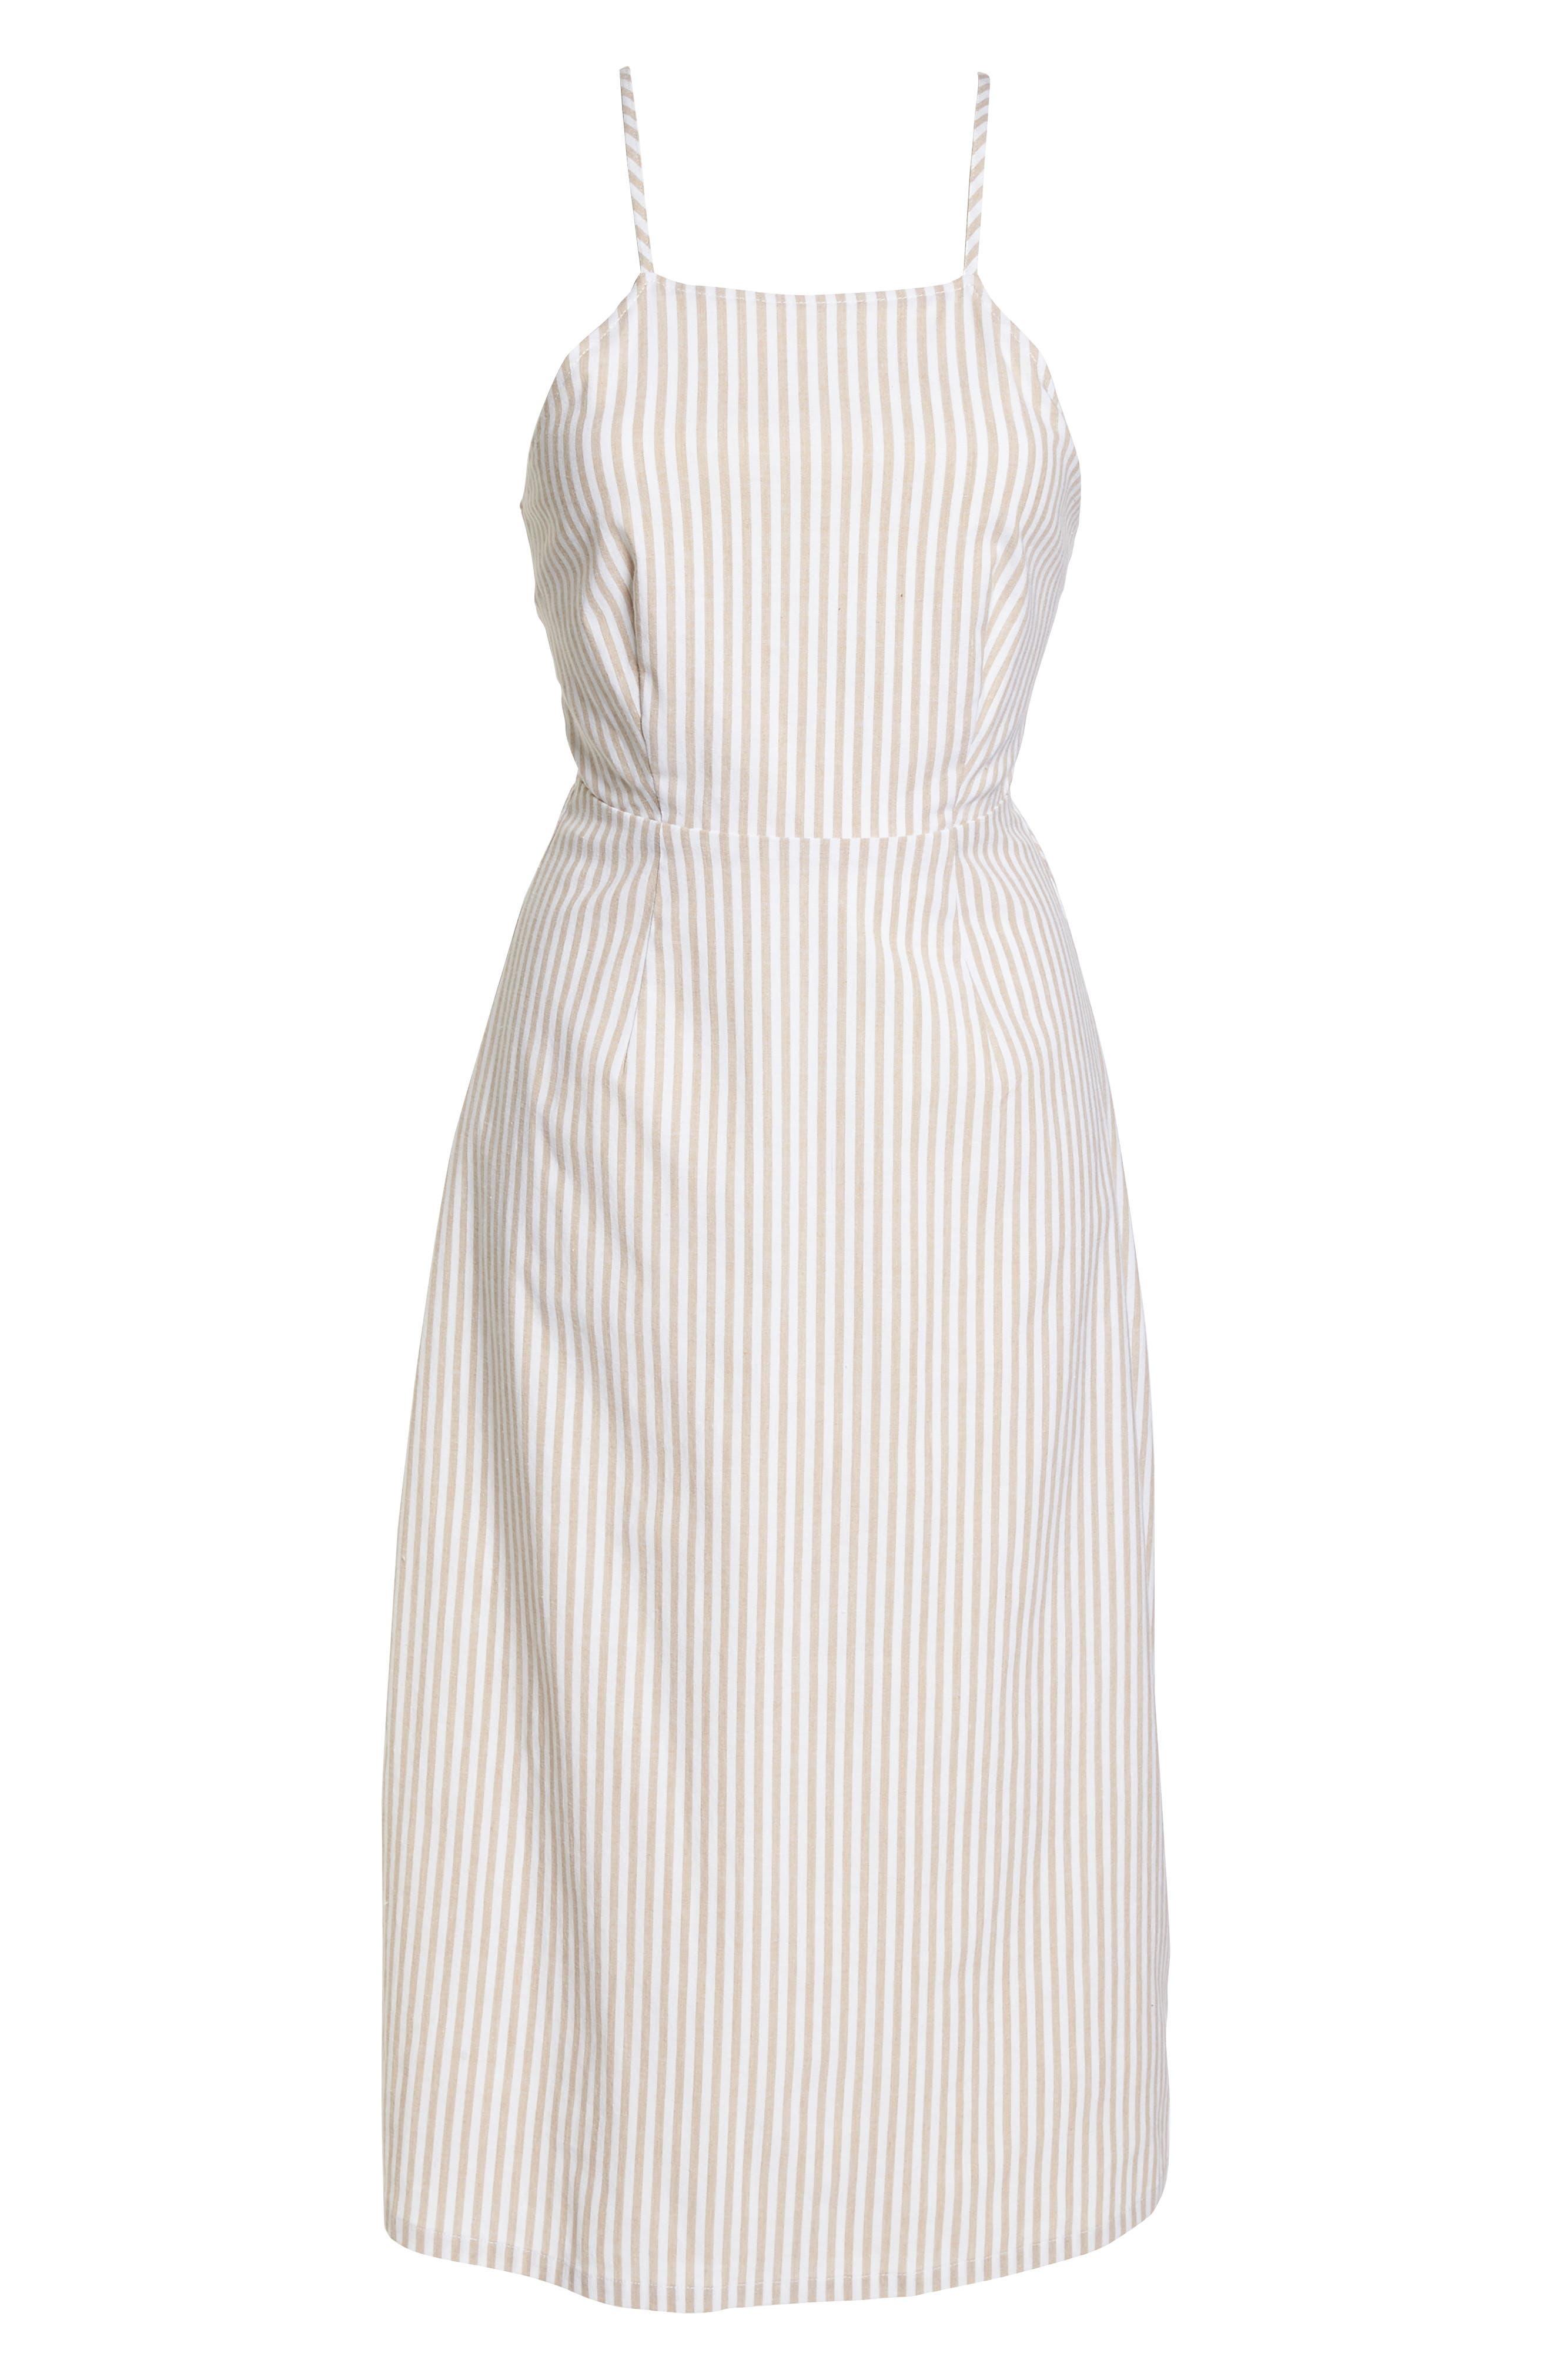 Halter Neck Midi Dress,                             Alternate thumbnail 7, color,                             250